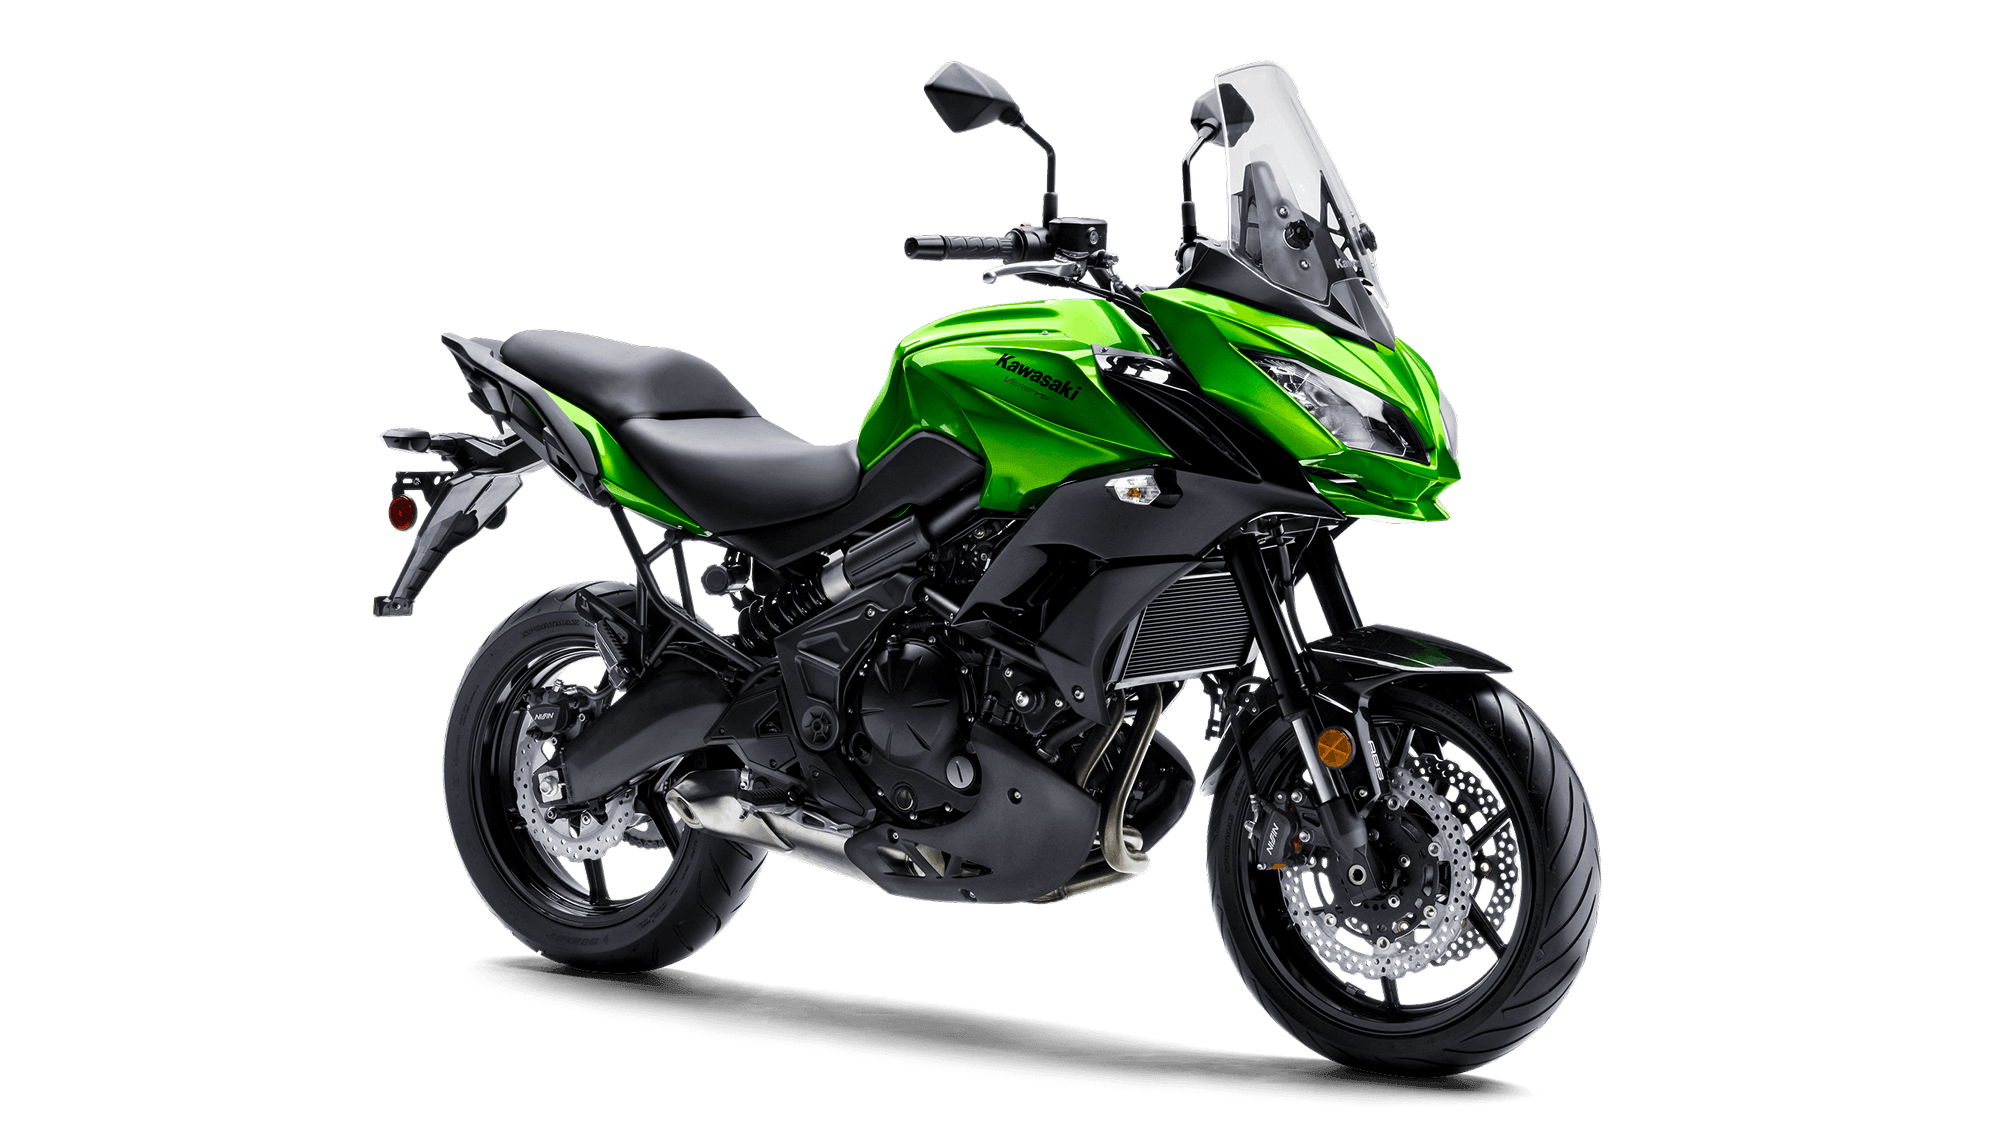 Moto del día: Kawasaki Versys 650 (2007)   espíritu RACER moto